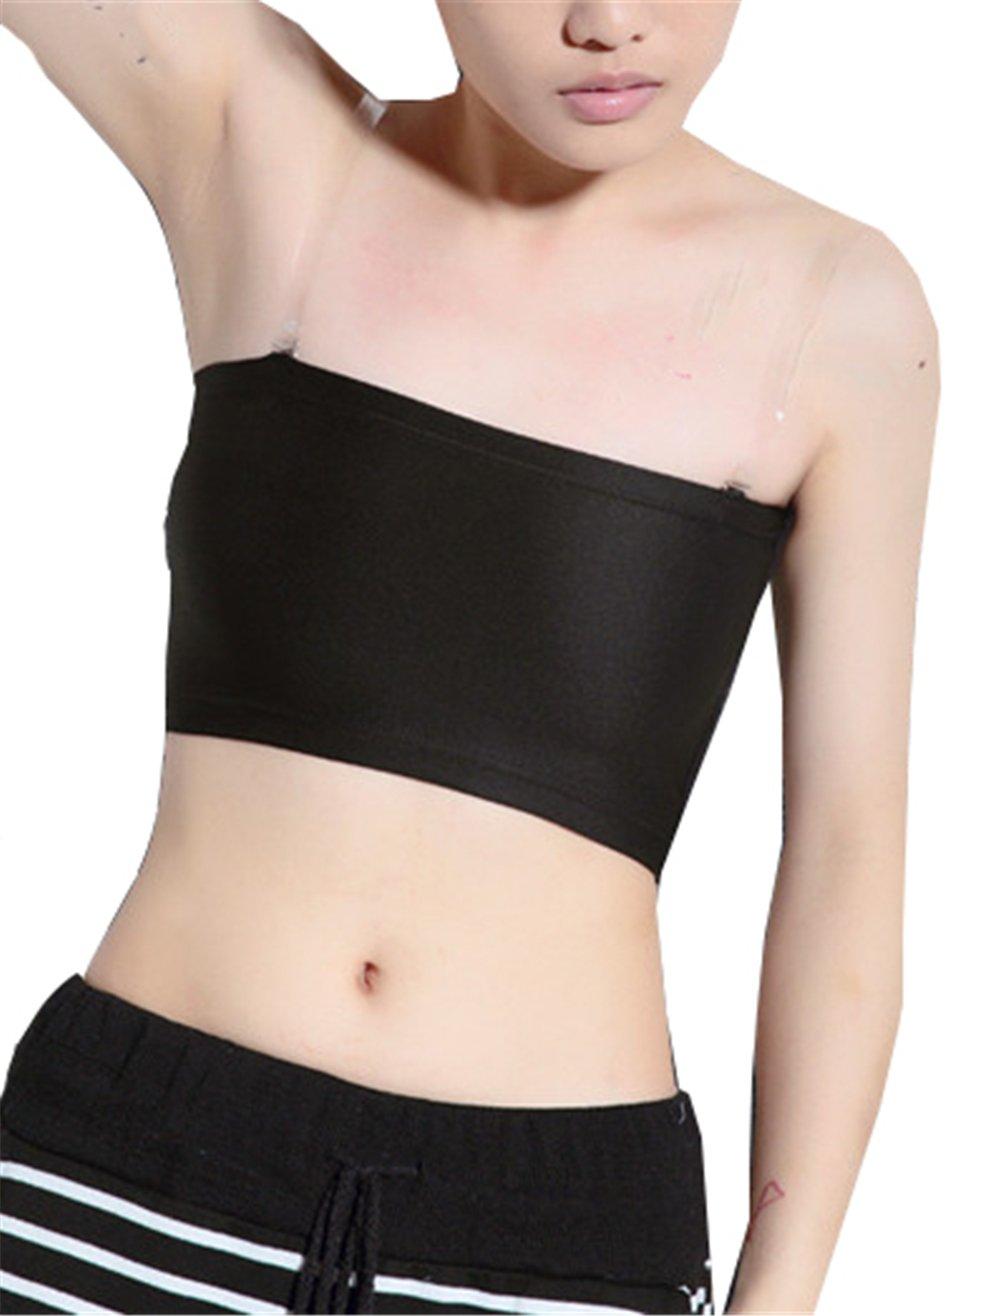 DXKIGO Breathable Super Flat Les Lesbian Tomboy Compression 3 Rows Clasp Chest Binders Lingerie & Underwear